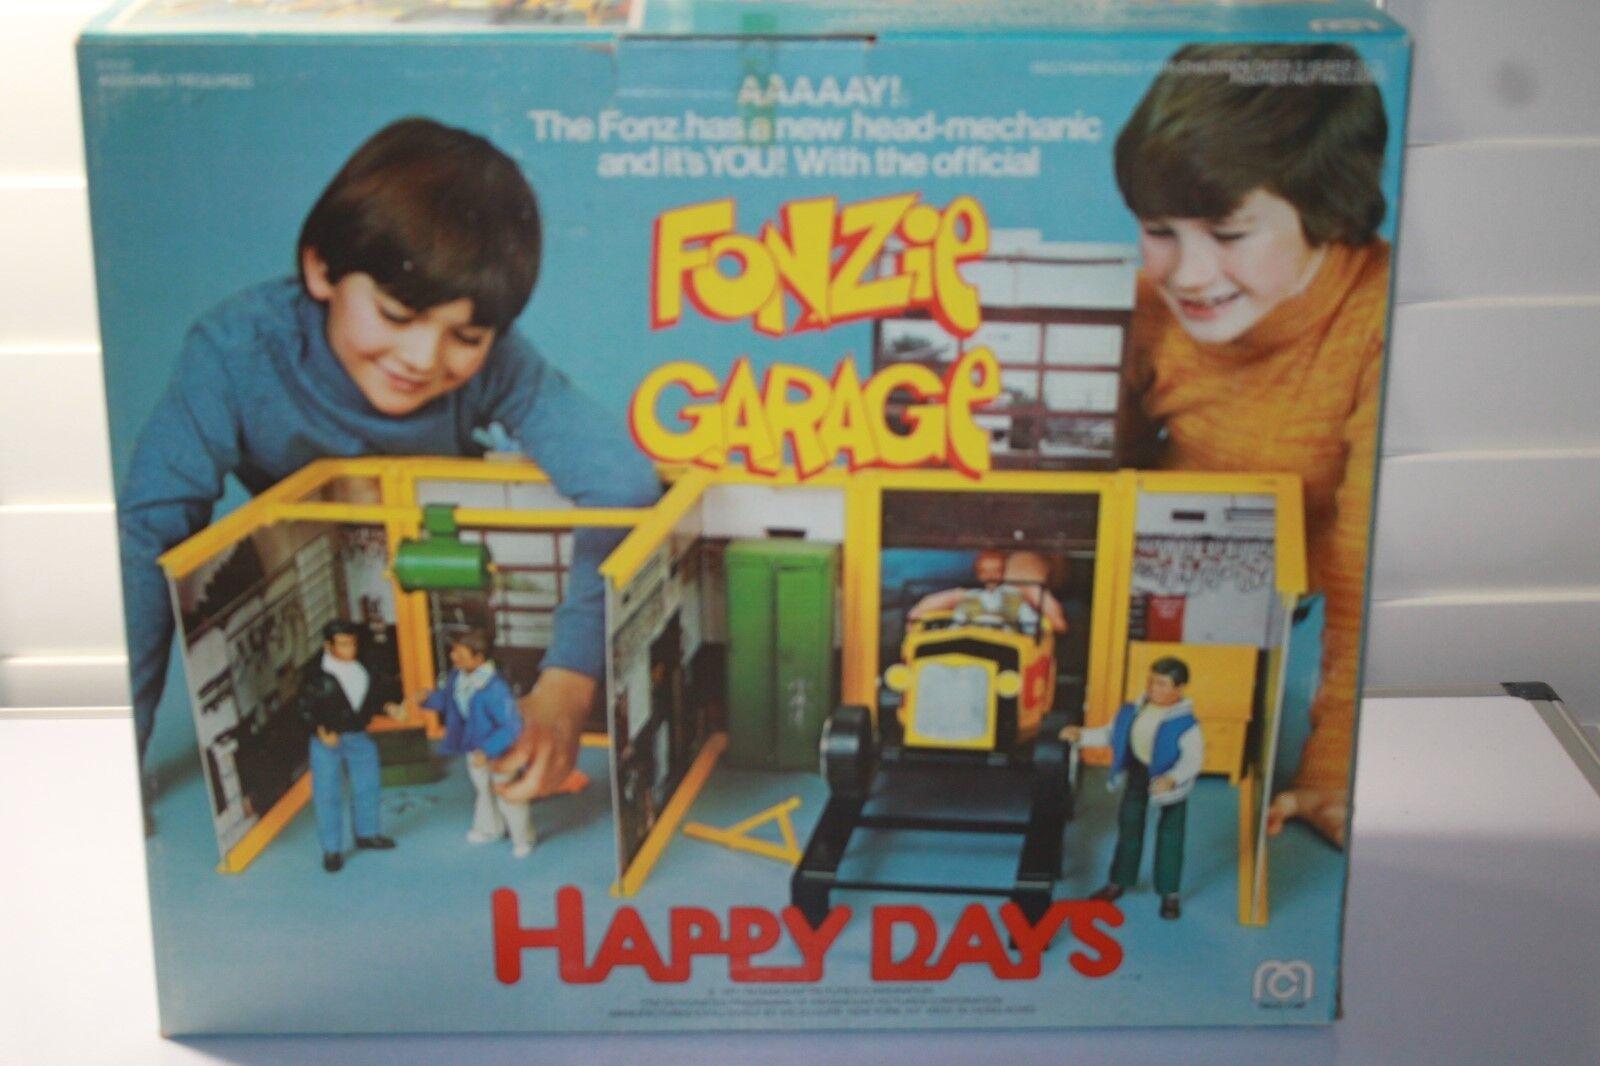 MEGO HAPPY DAYS  FONZIE GARAGE NEW IN OPEN BOX UNUSED COMPLETE RARE